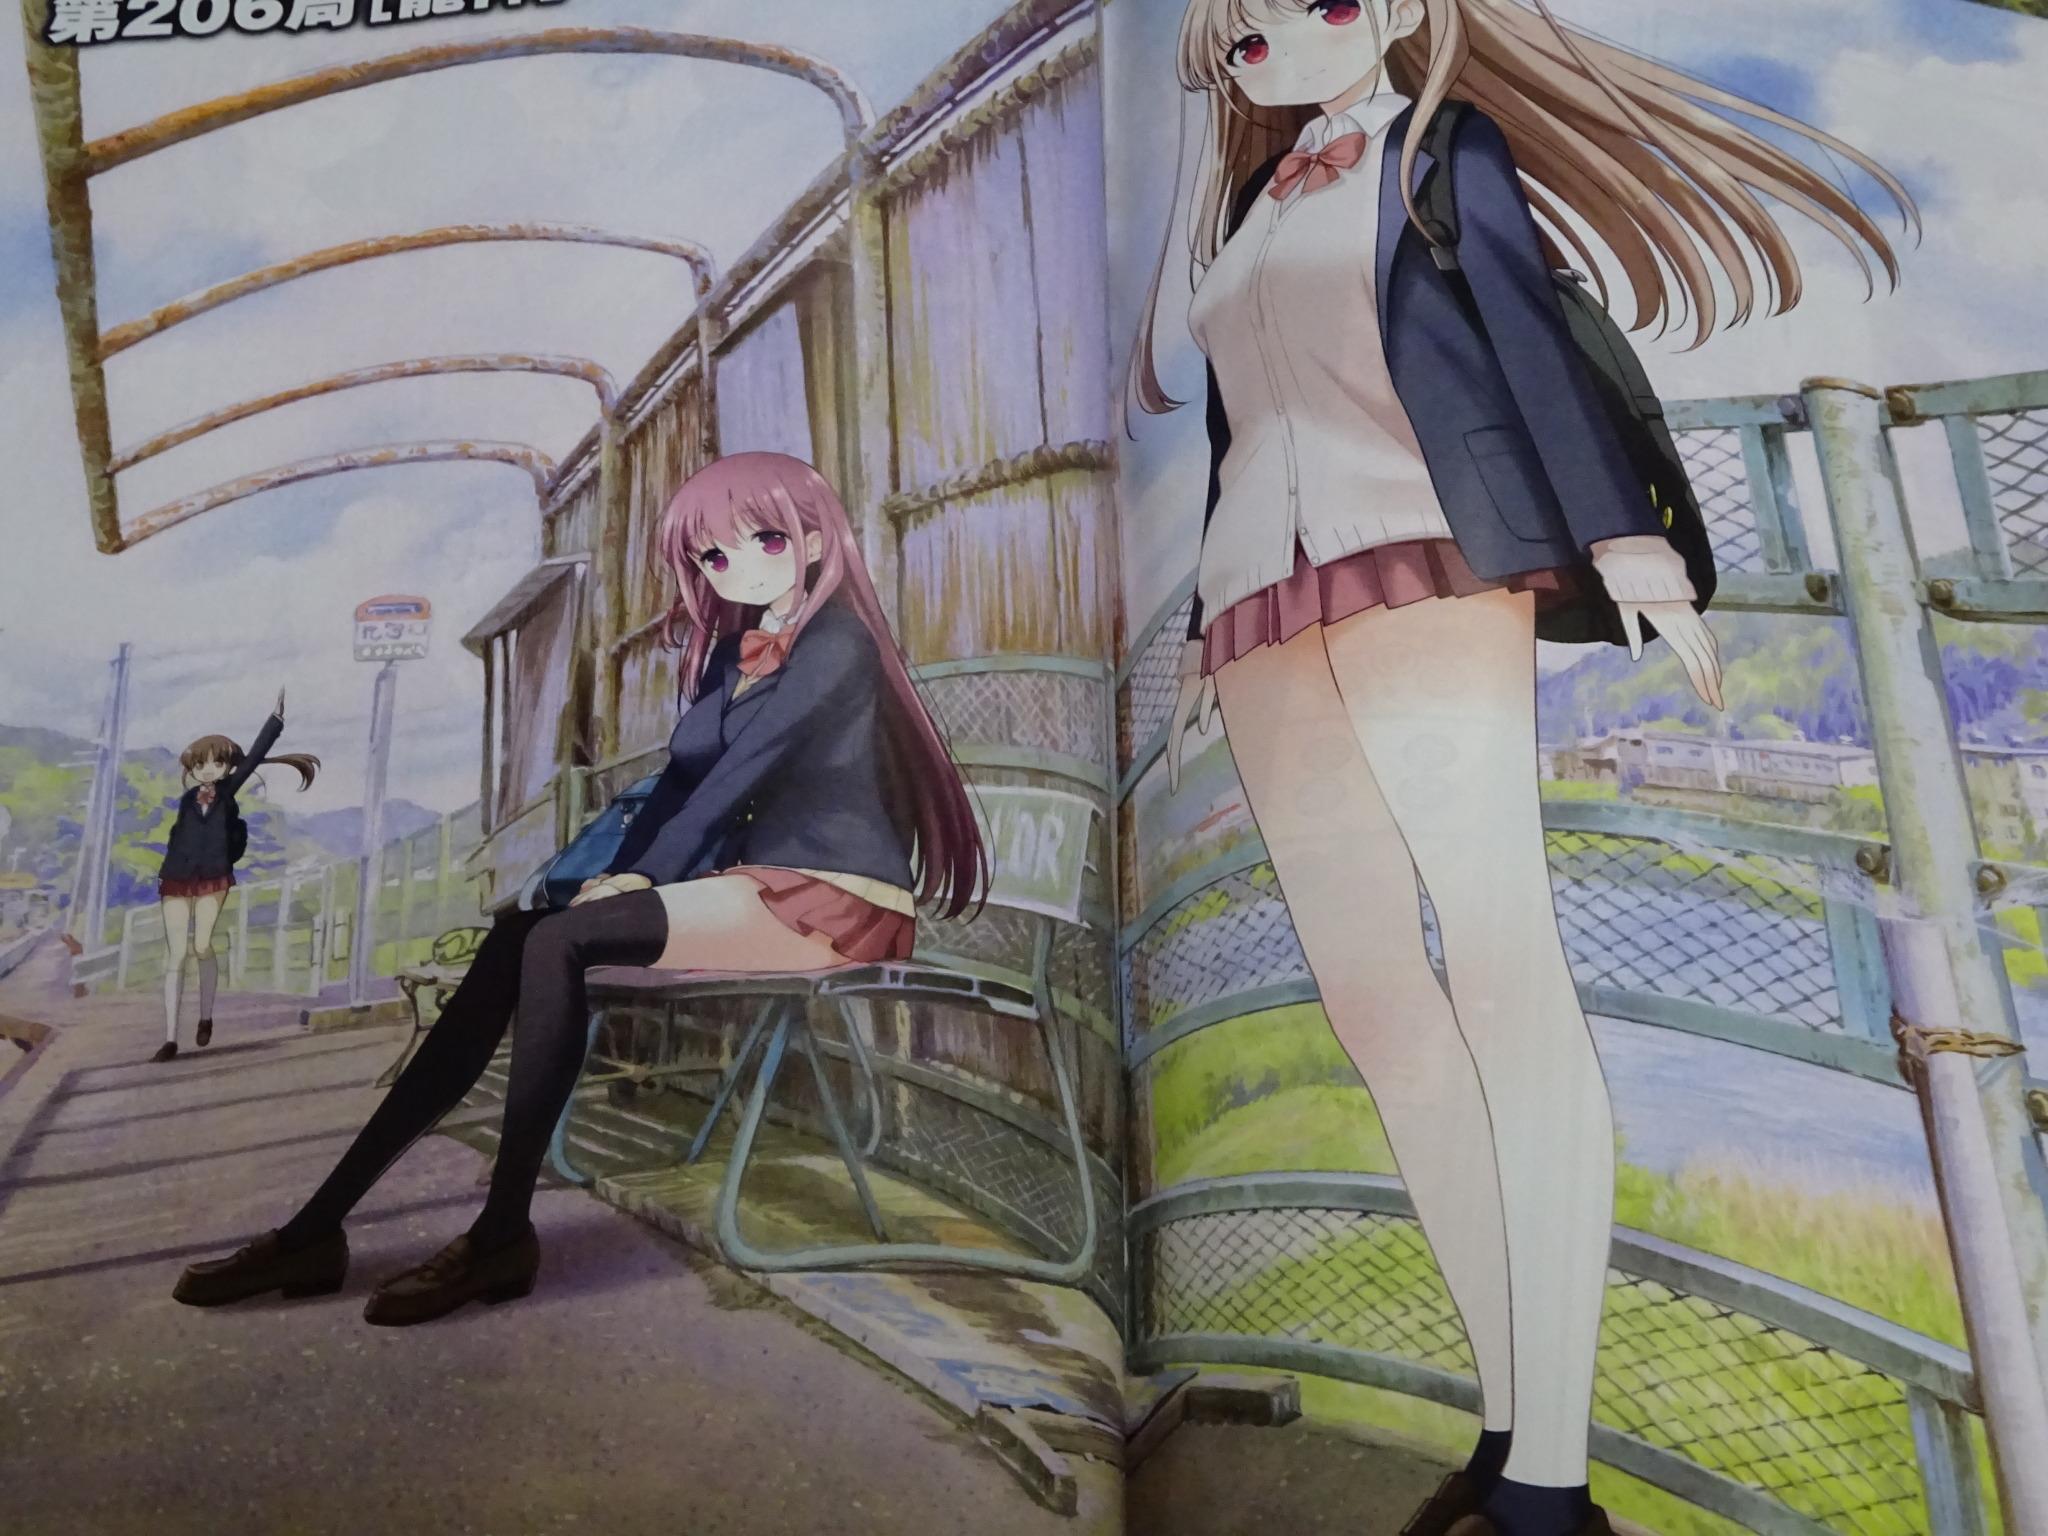 KonyoKOUDOU — 咲-Saki- 第206局[龍神] 感想―前に進み始めた少女への ...